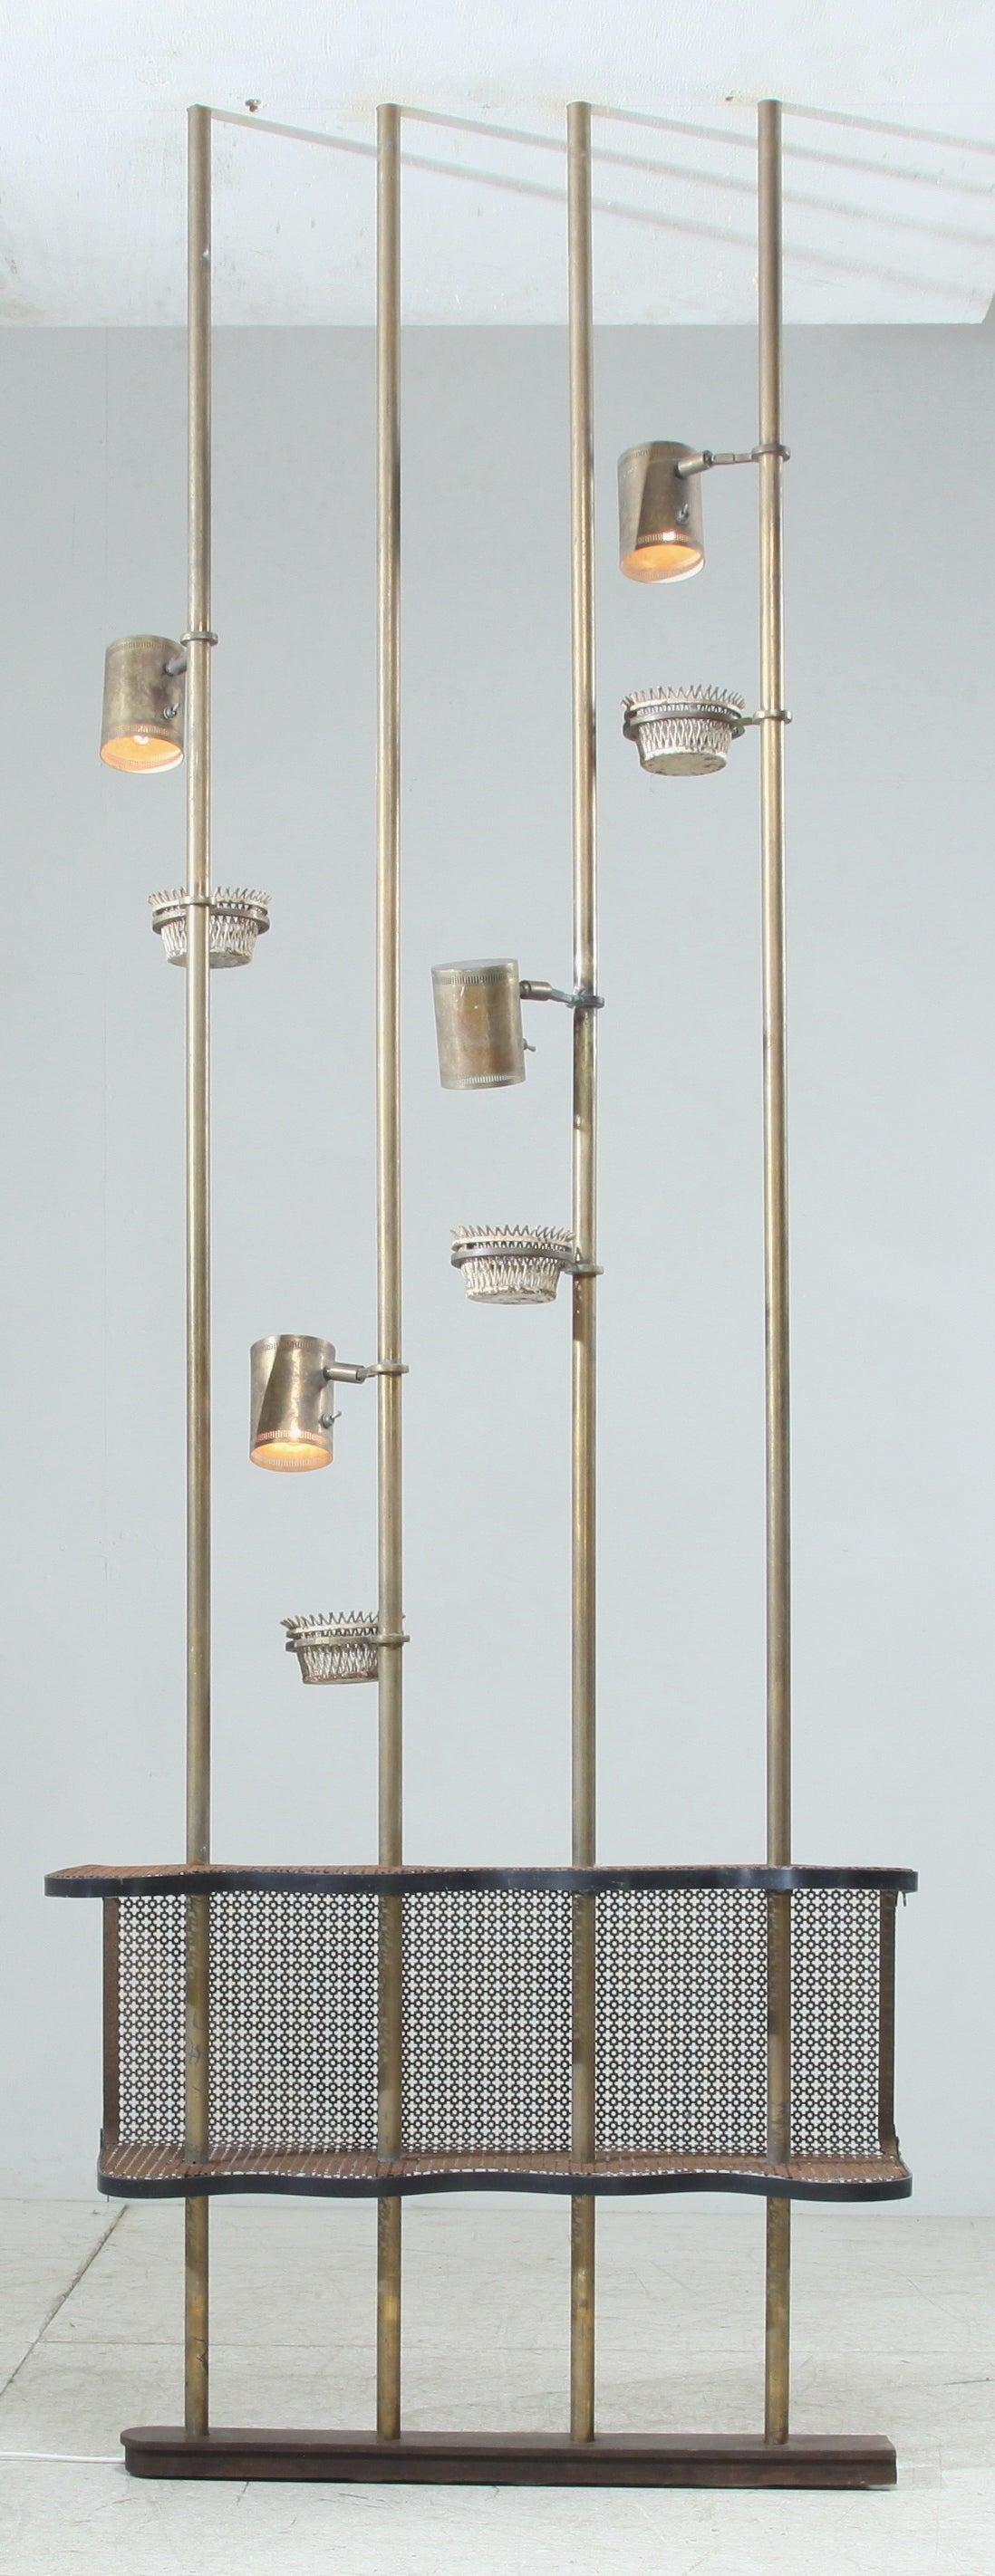 Mathieu Mategot Custom Made Brass Illuminating Room